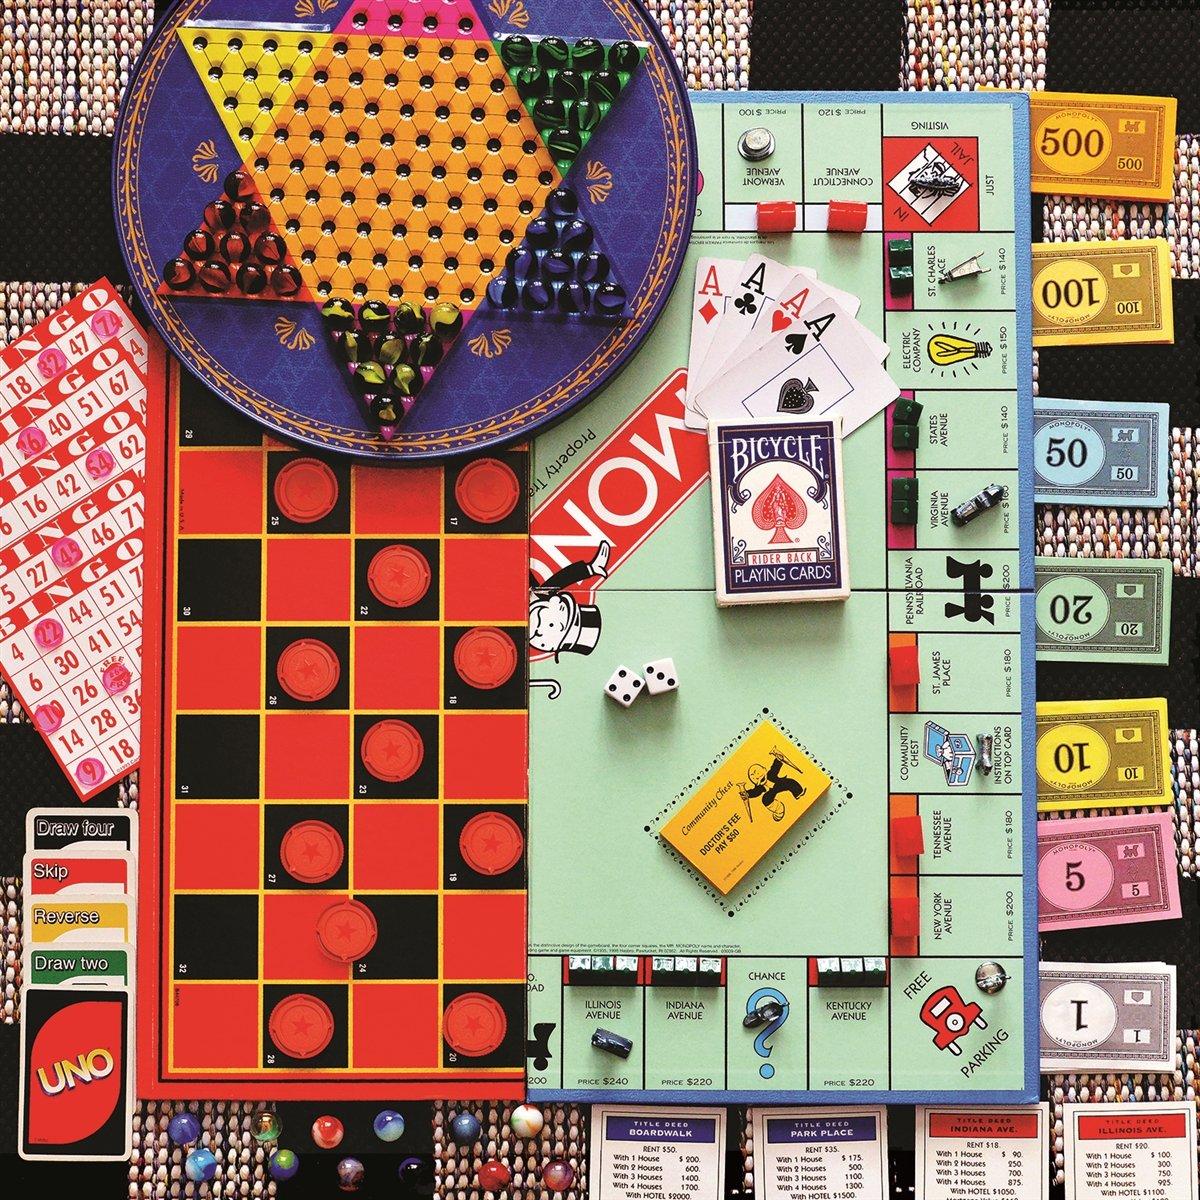 Springbok Puzzles Board Games Jigsaw Puzzle (500 Piece) 33-02521